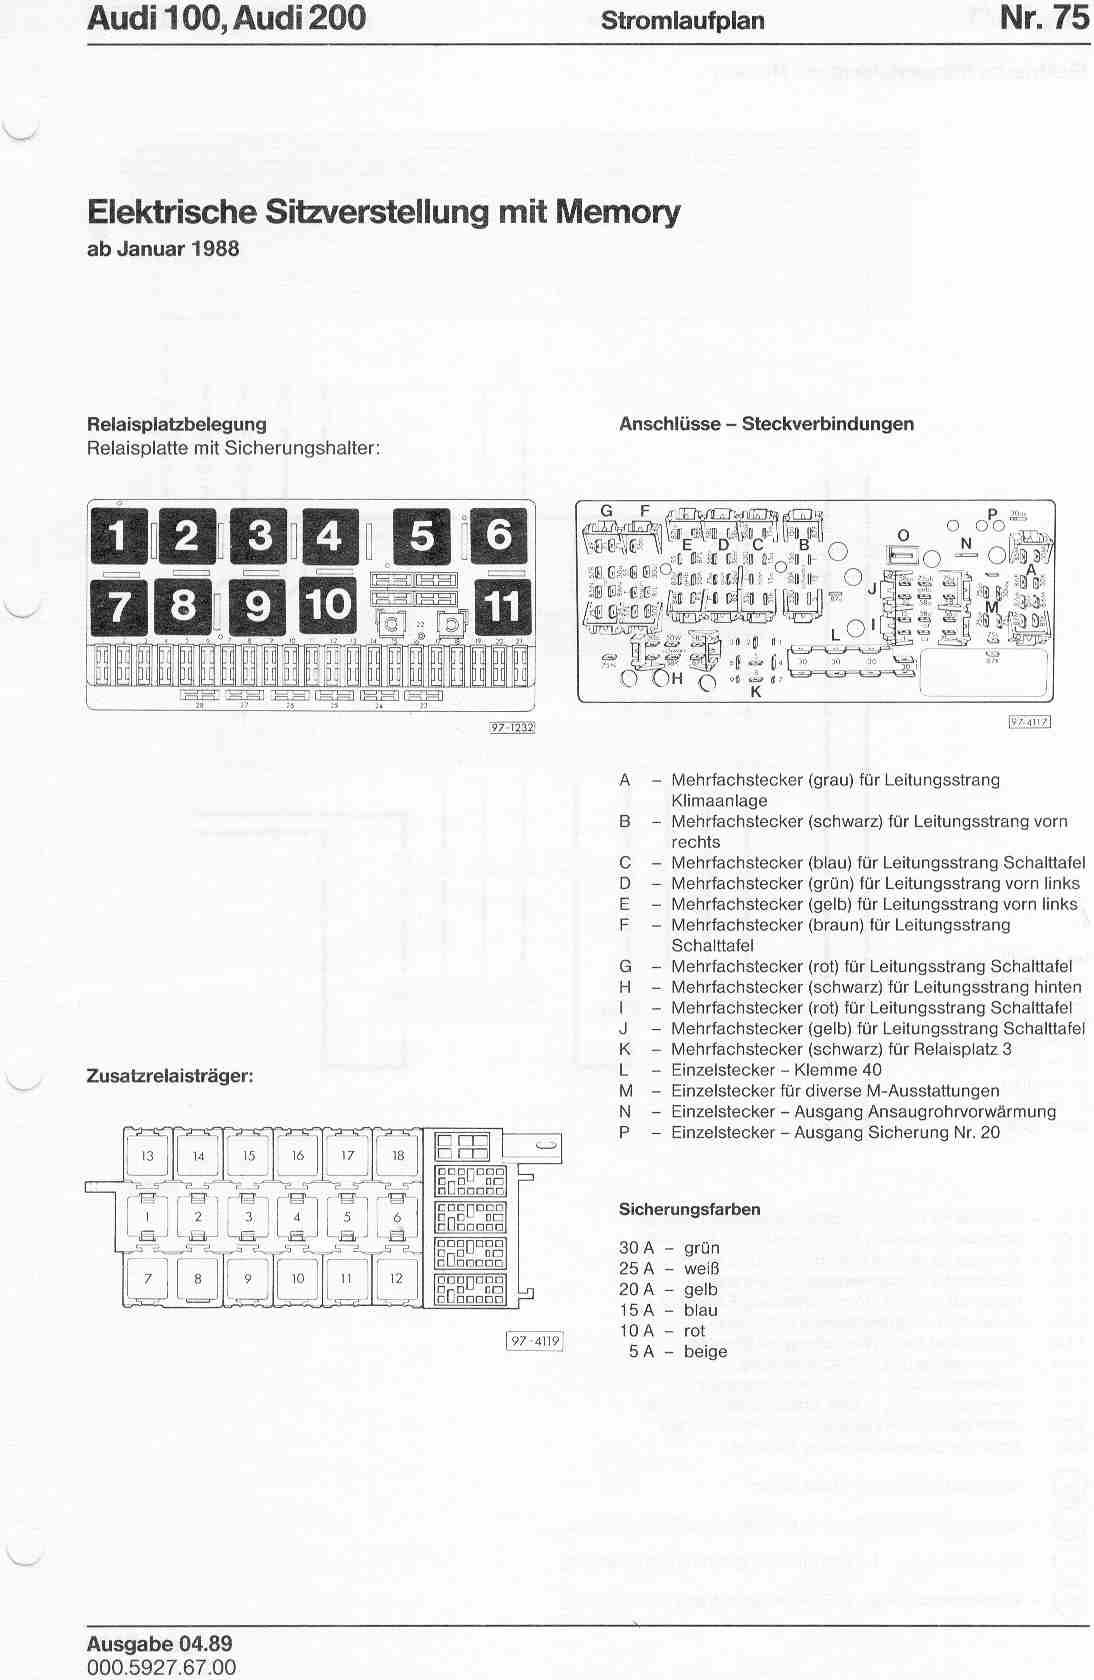 audi 80 fuse box tg 4212  audi 80 b4 central locking wiring diagram wiring diagram  audi 80 b4 central locking wiring